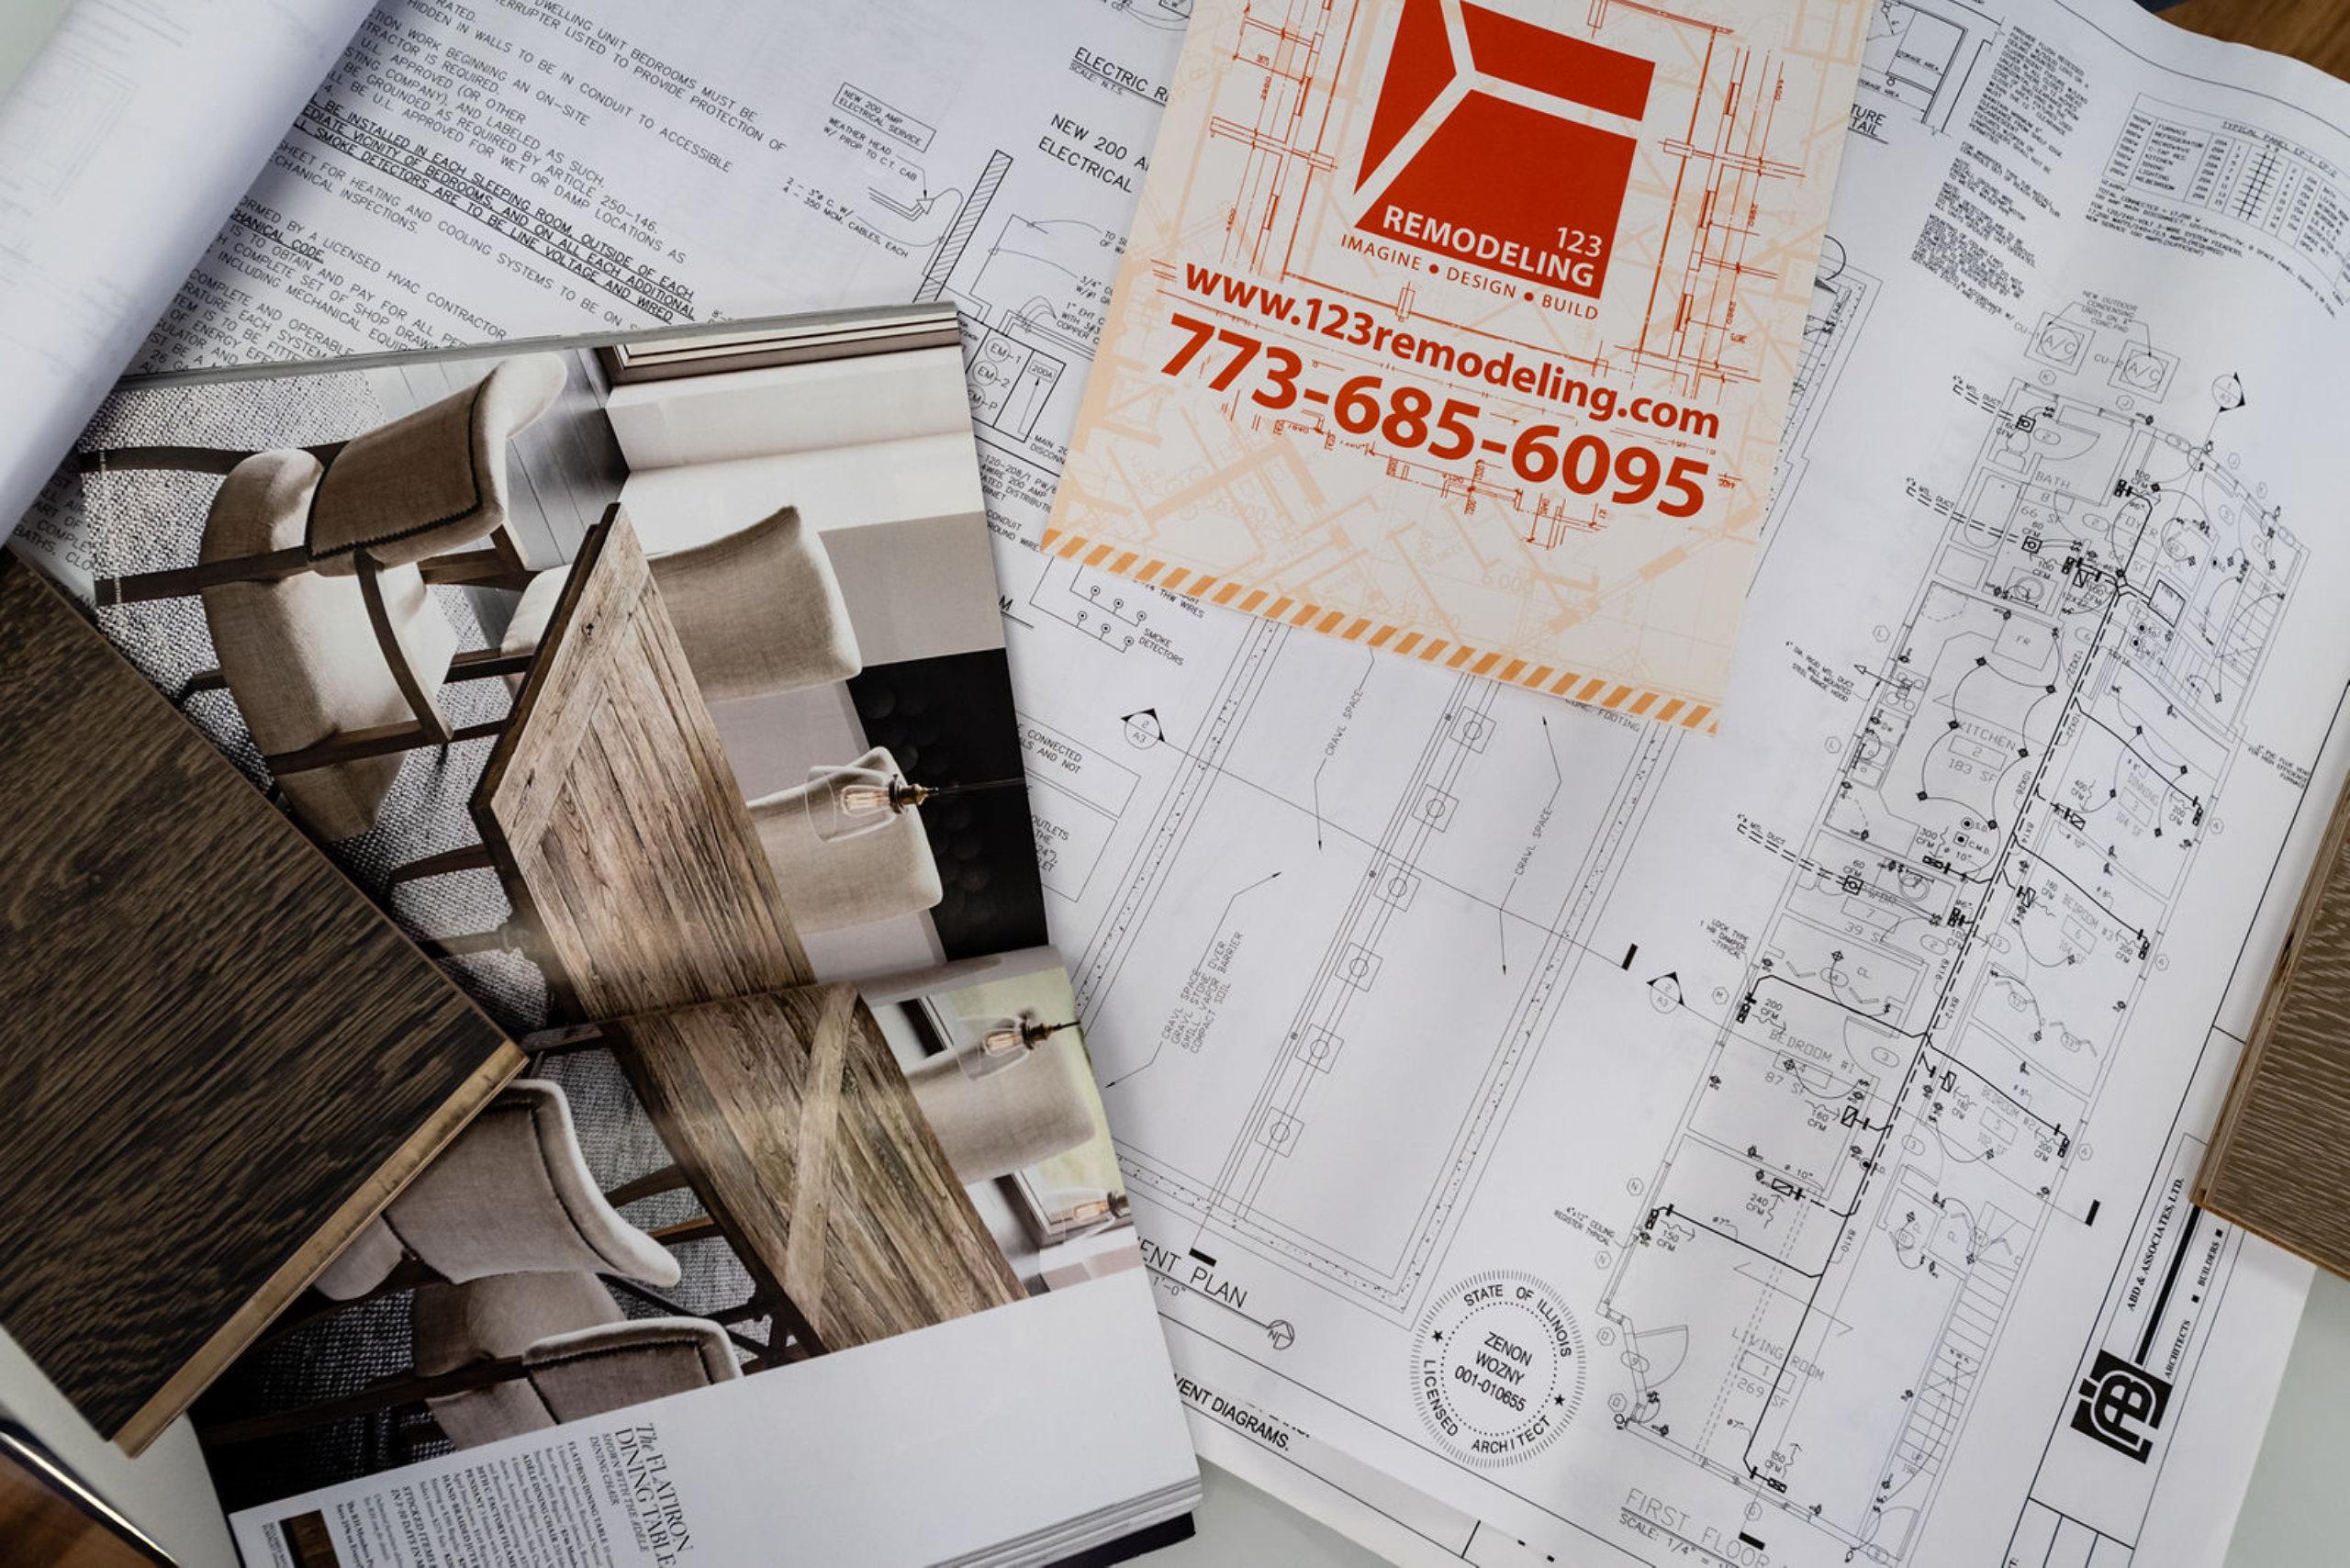 123 Remodeling General Contractor